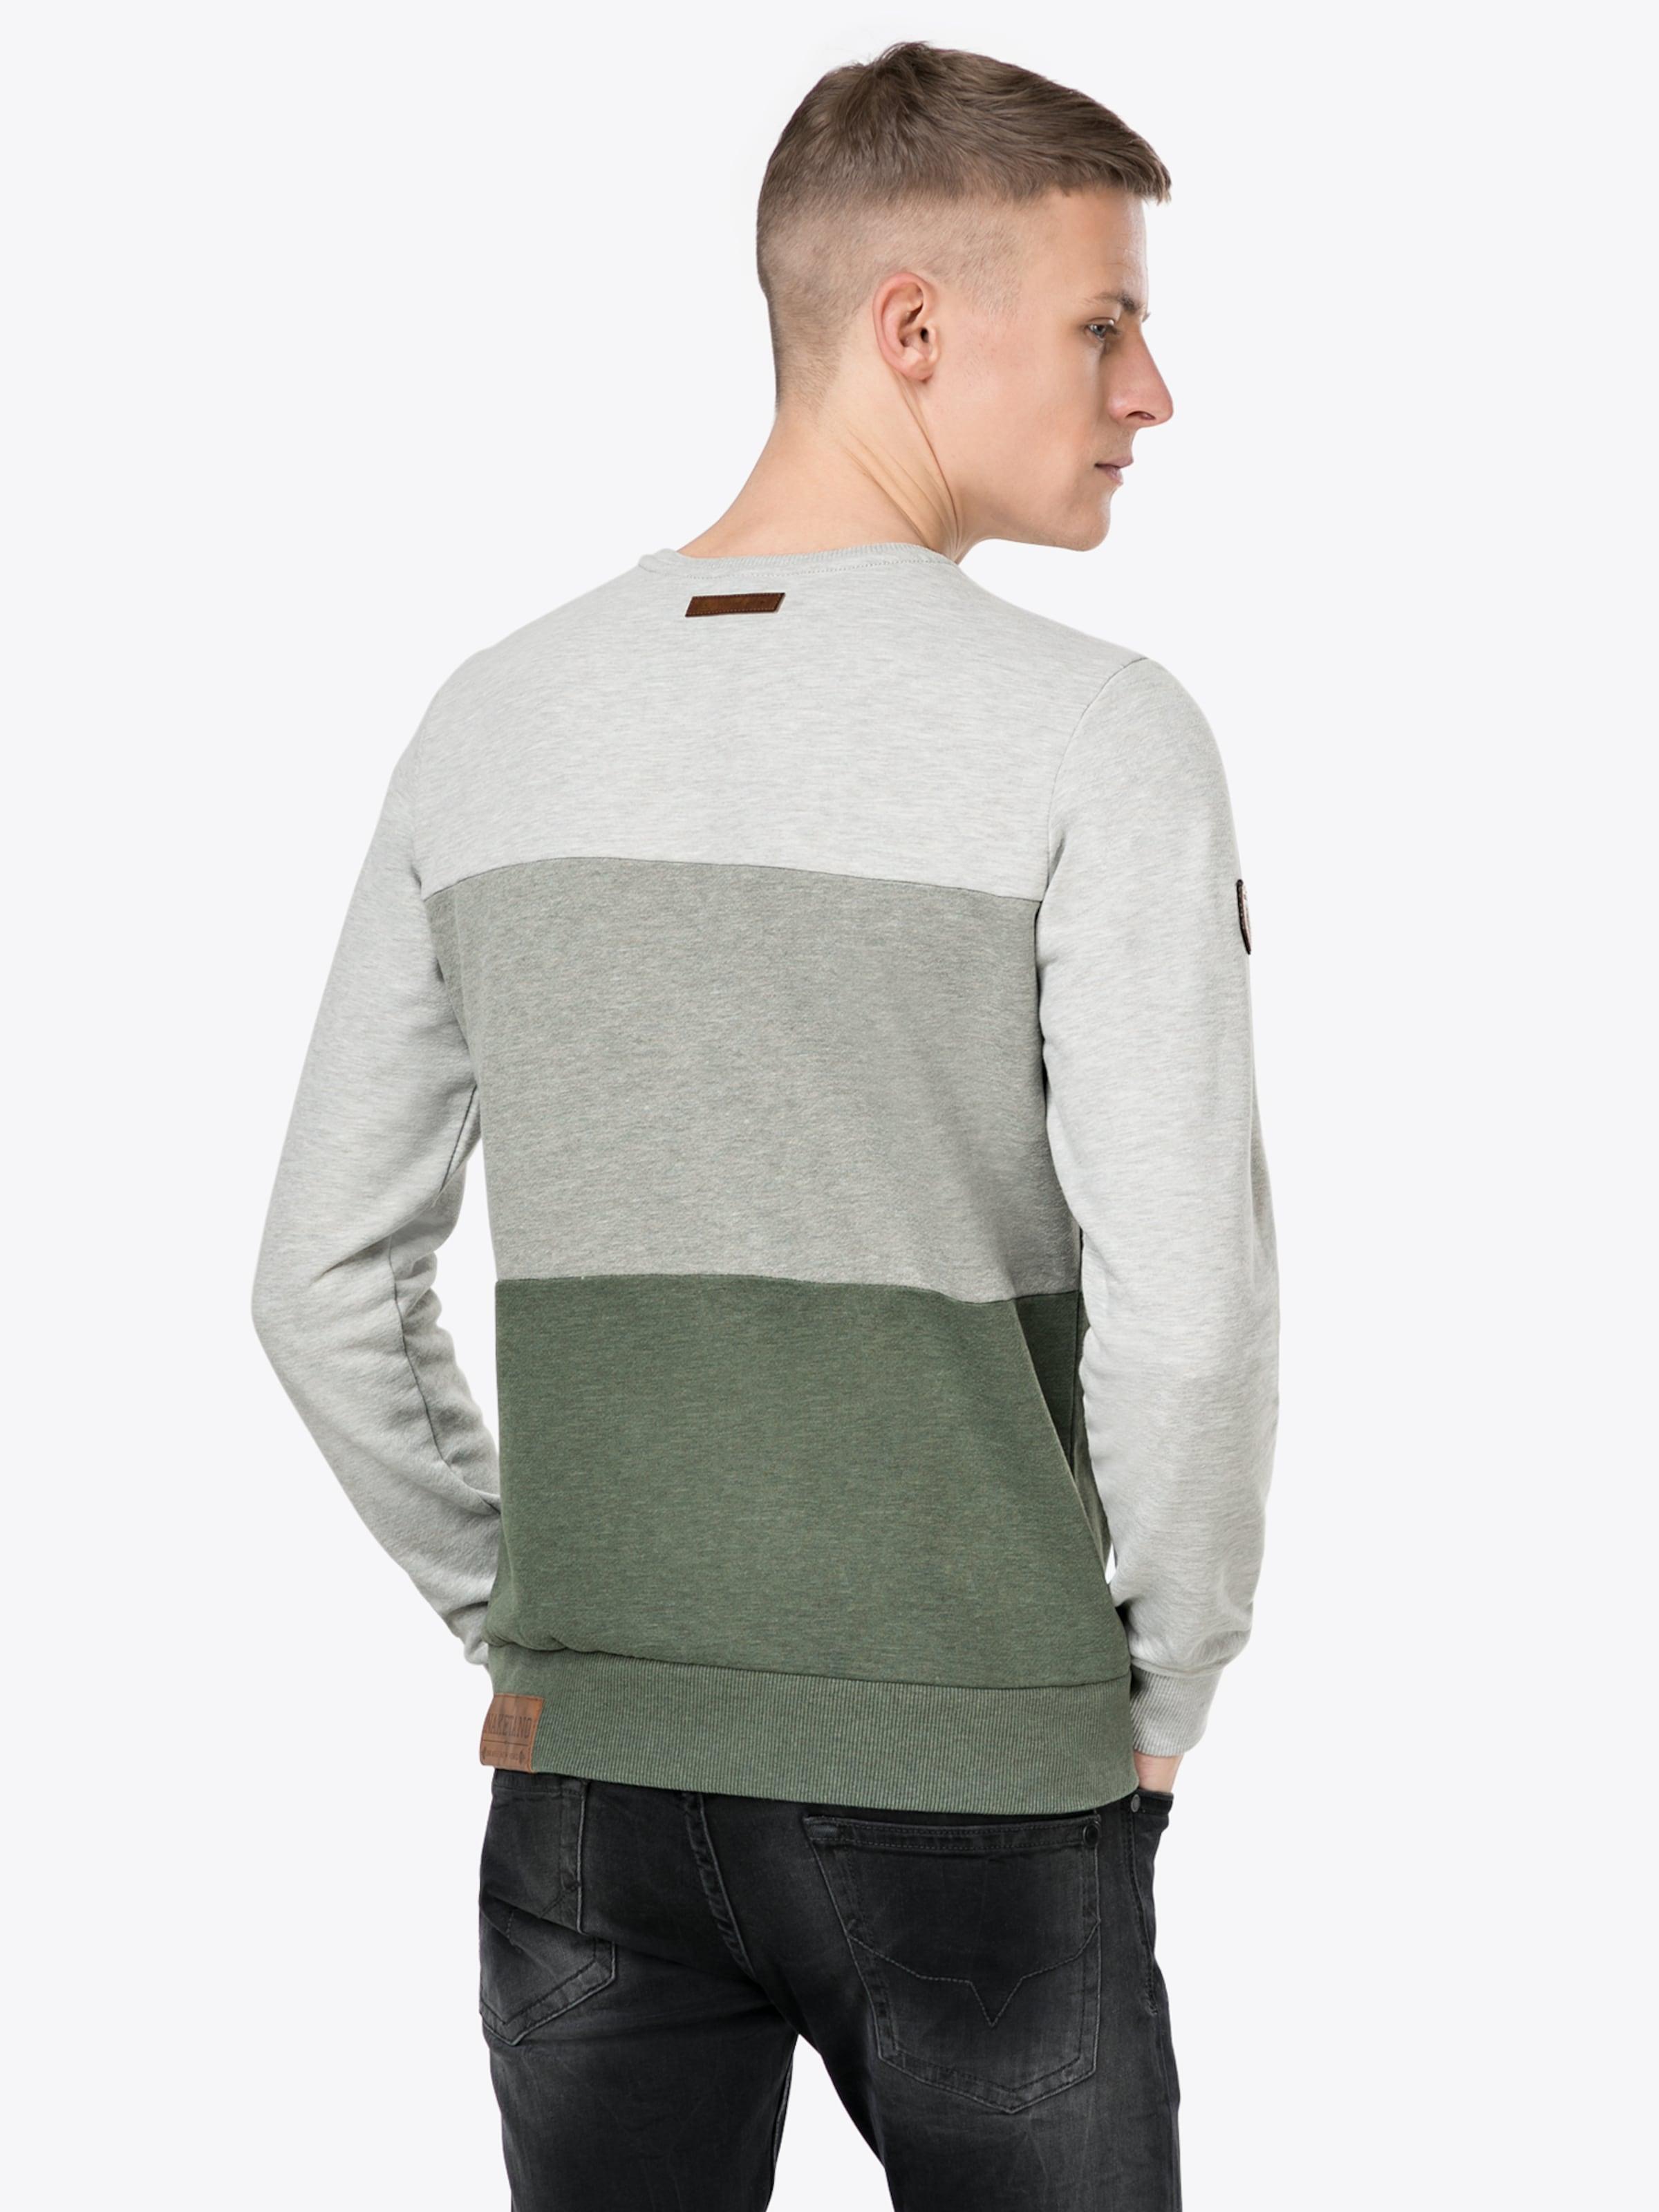 Vert Sweat GrisFoncé Naketano shirt Gazon En wONnZ0PX8k